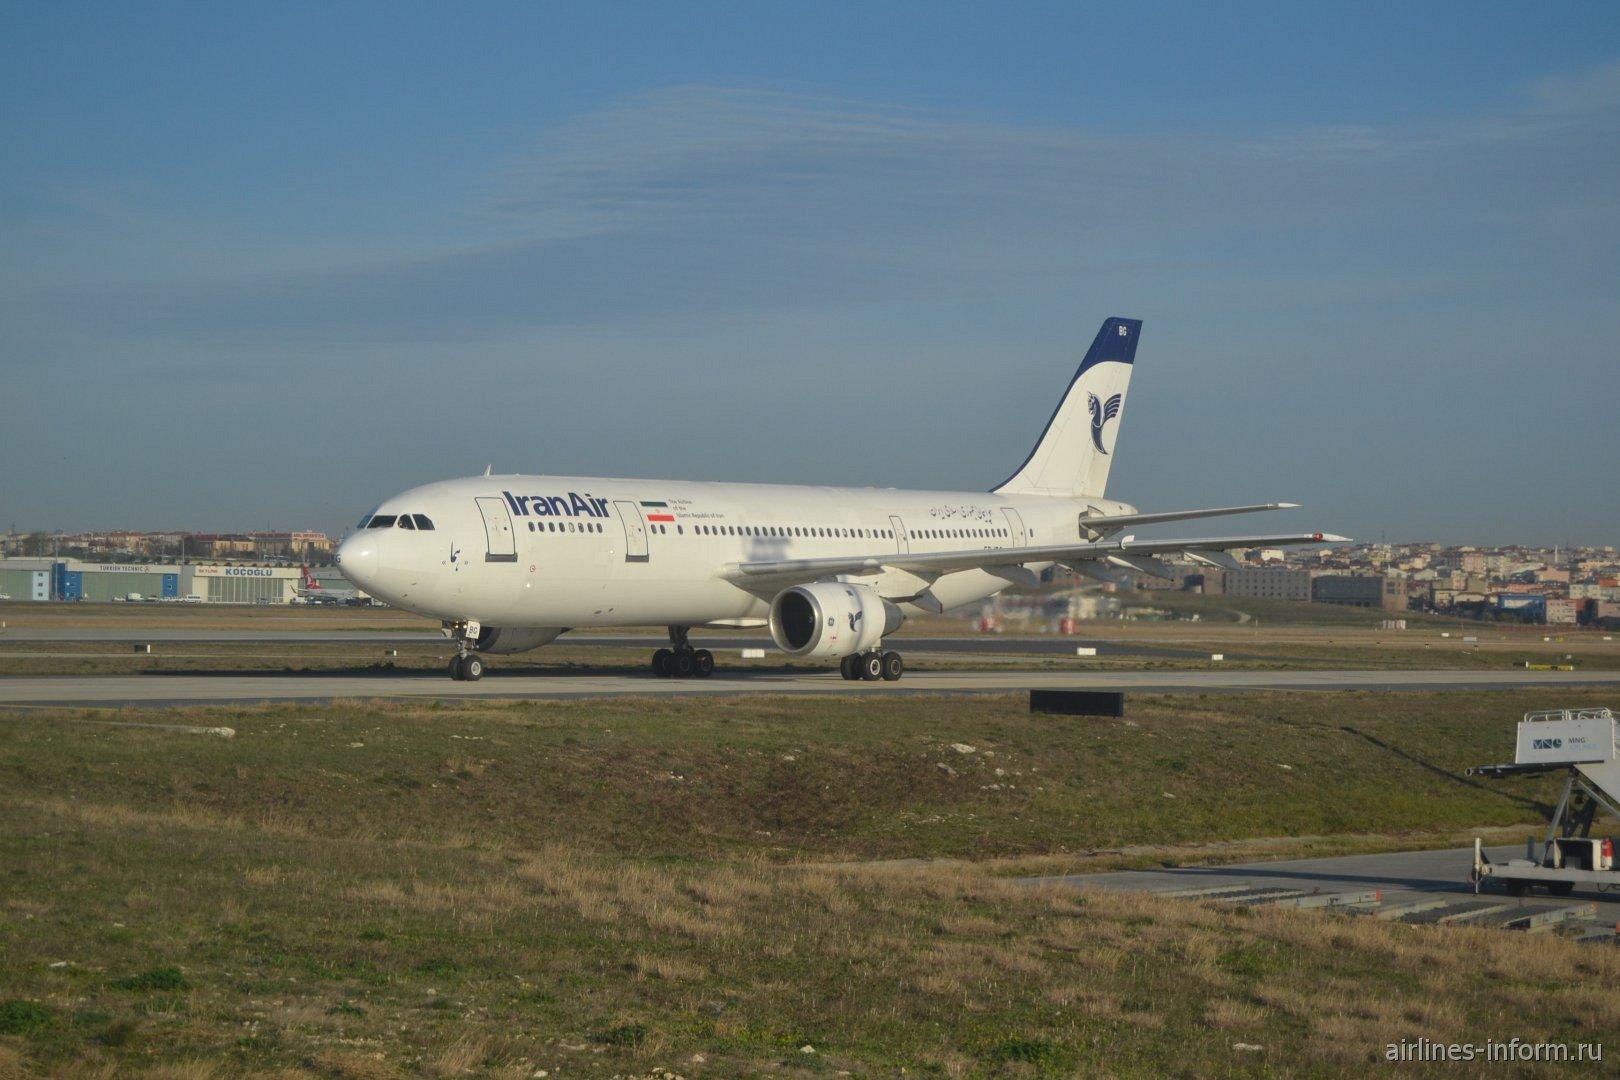 Самолет Airbus A300-600 авиакомпании Iran Air в аэропорту Стамбул Ататюрк